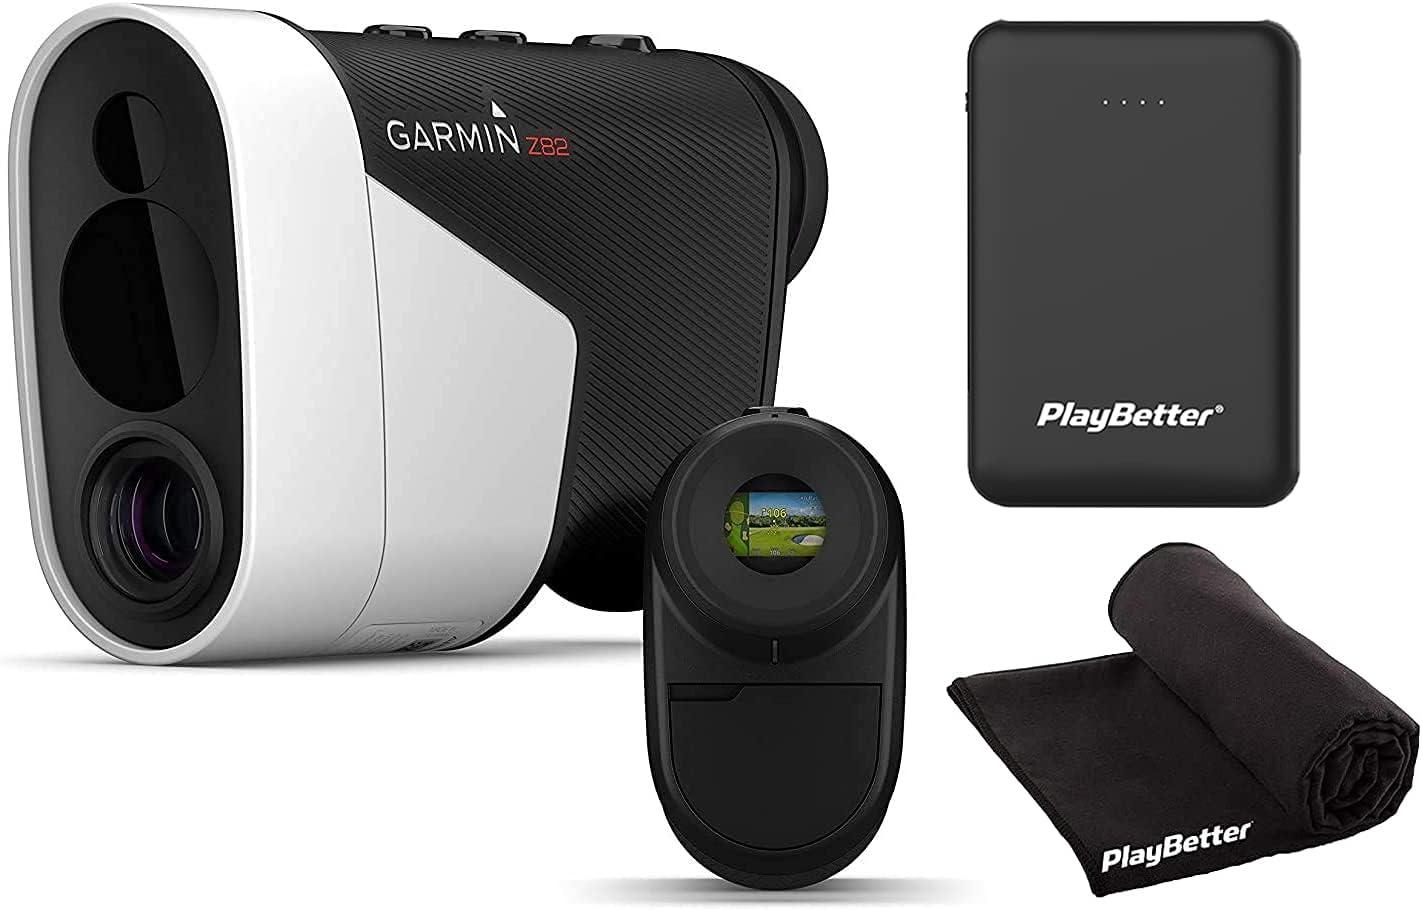 Garmin Approach Z82 Laser Golf with Challenge the lowest price Discount mail order GPS Rangefinder Power Bundle